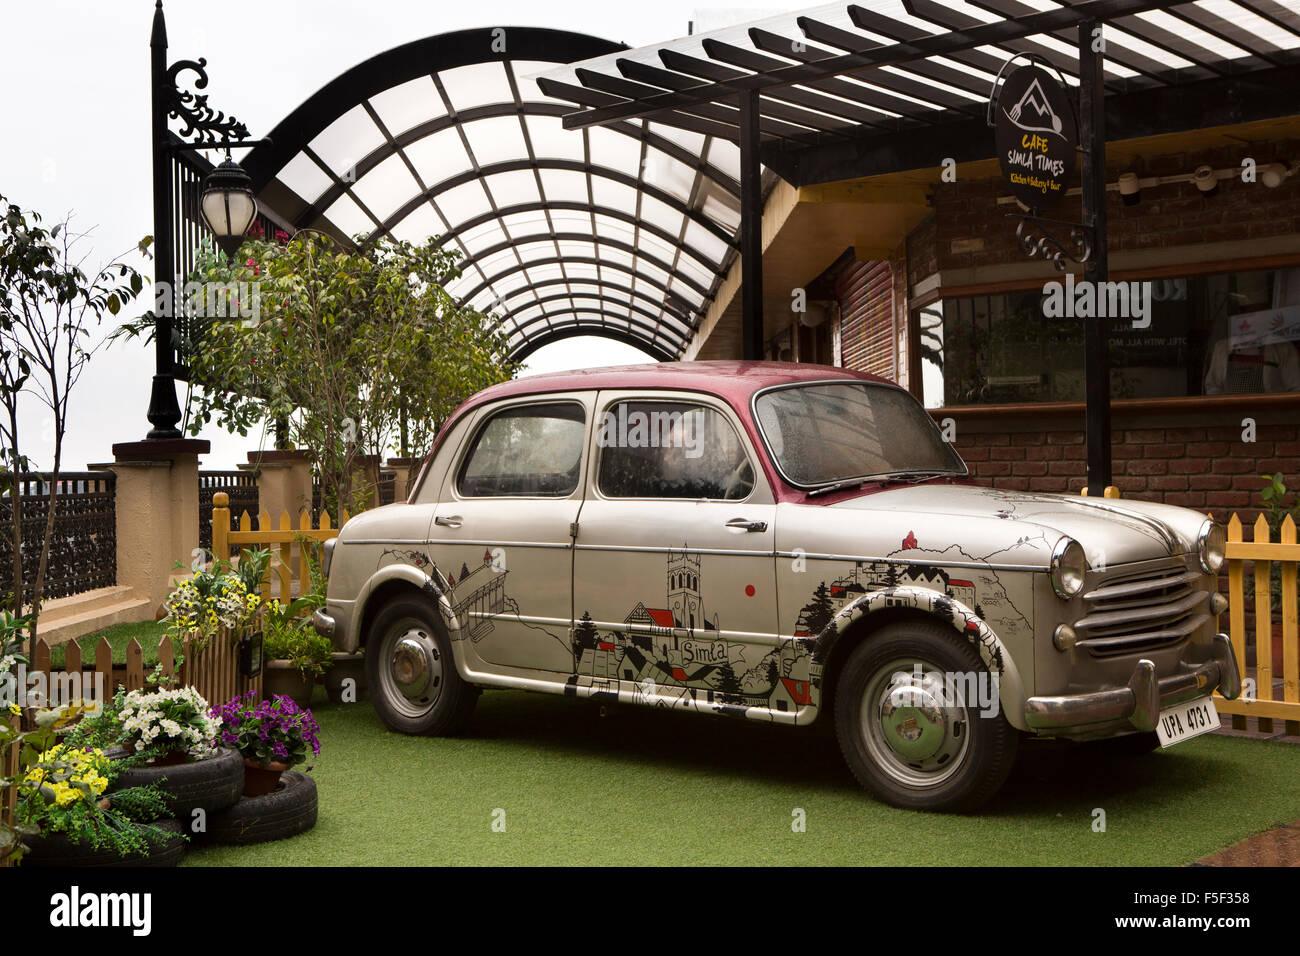 India, Himachal Pradesh, Shimla (Simla), Mall Road, vintage Hindustan Ambassador car outside Shimla Times Cafe - Stock Image